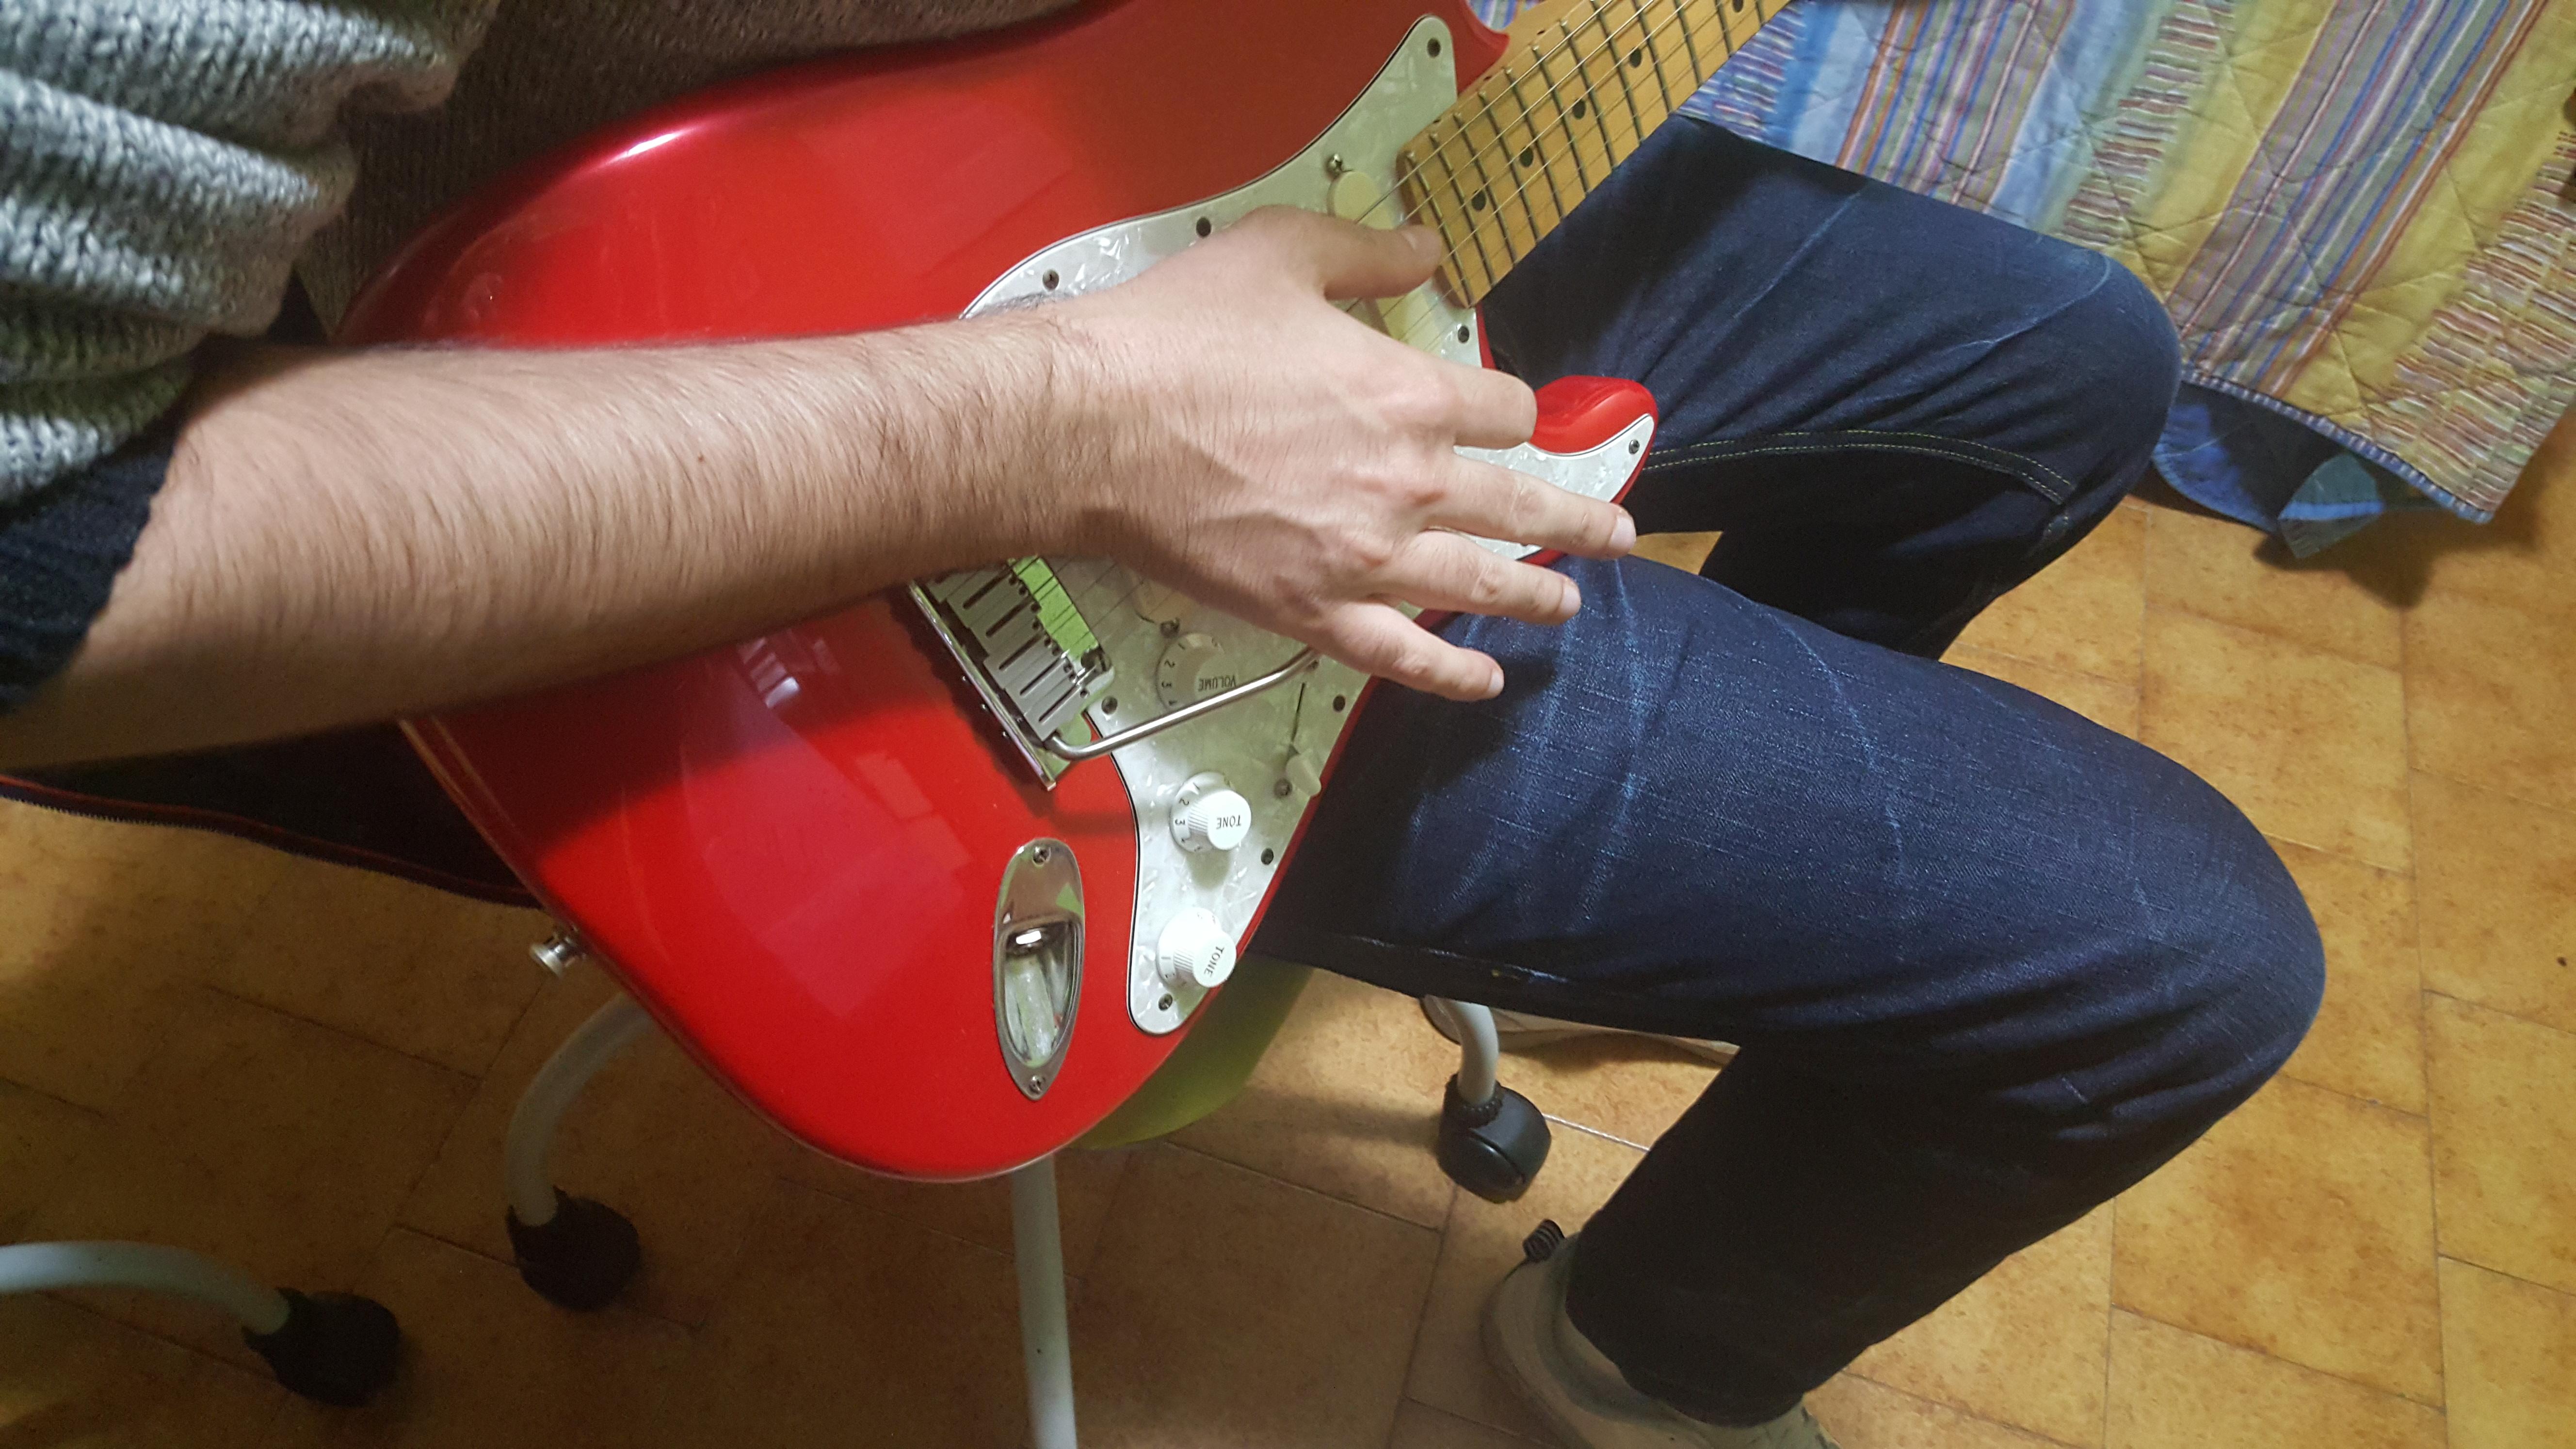 Short tremolo - handled